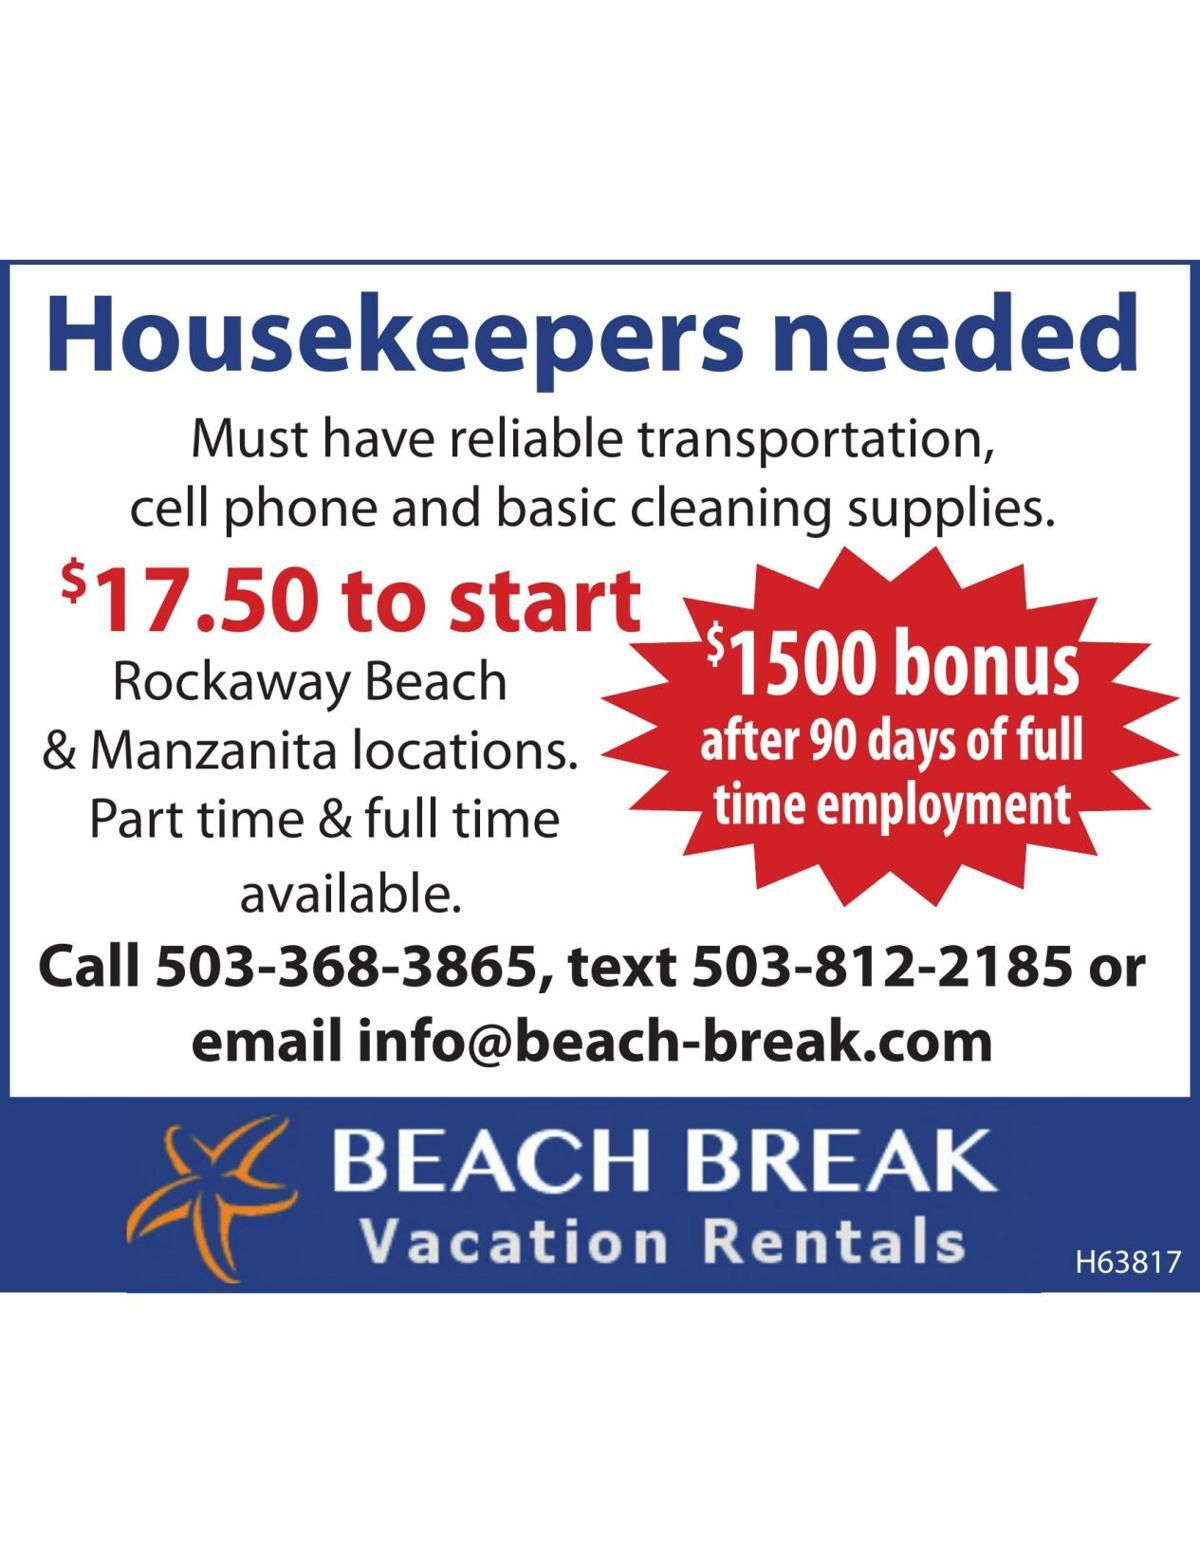 Hosekeepers Needed 1500 dollar bonus Beach Break Vacation Rentals Oregon Coast 070621